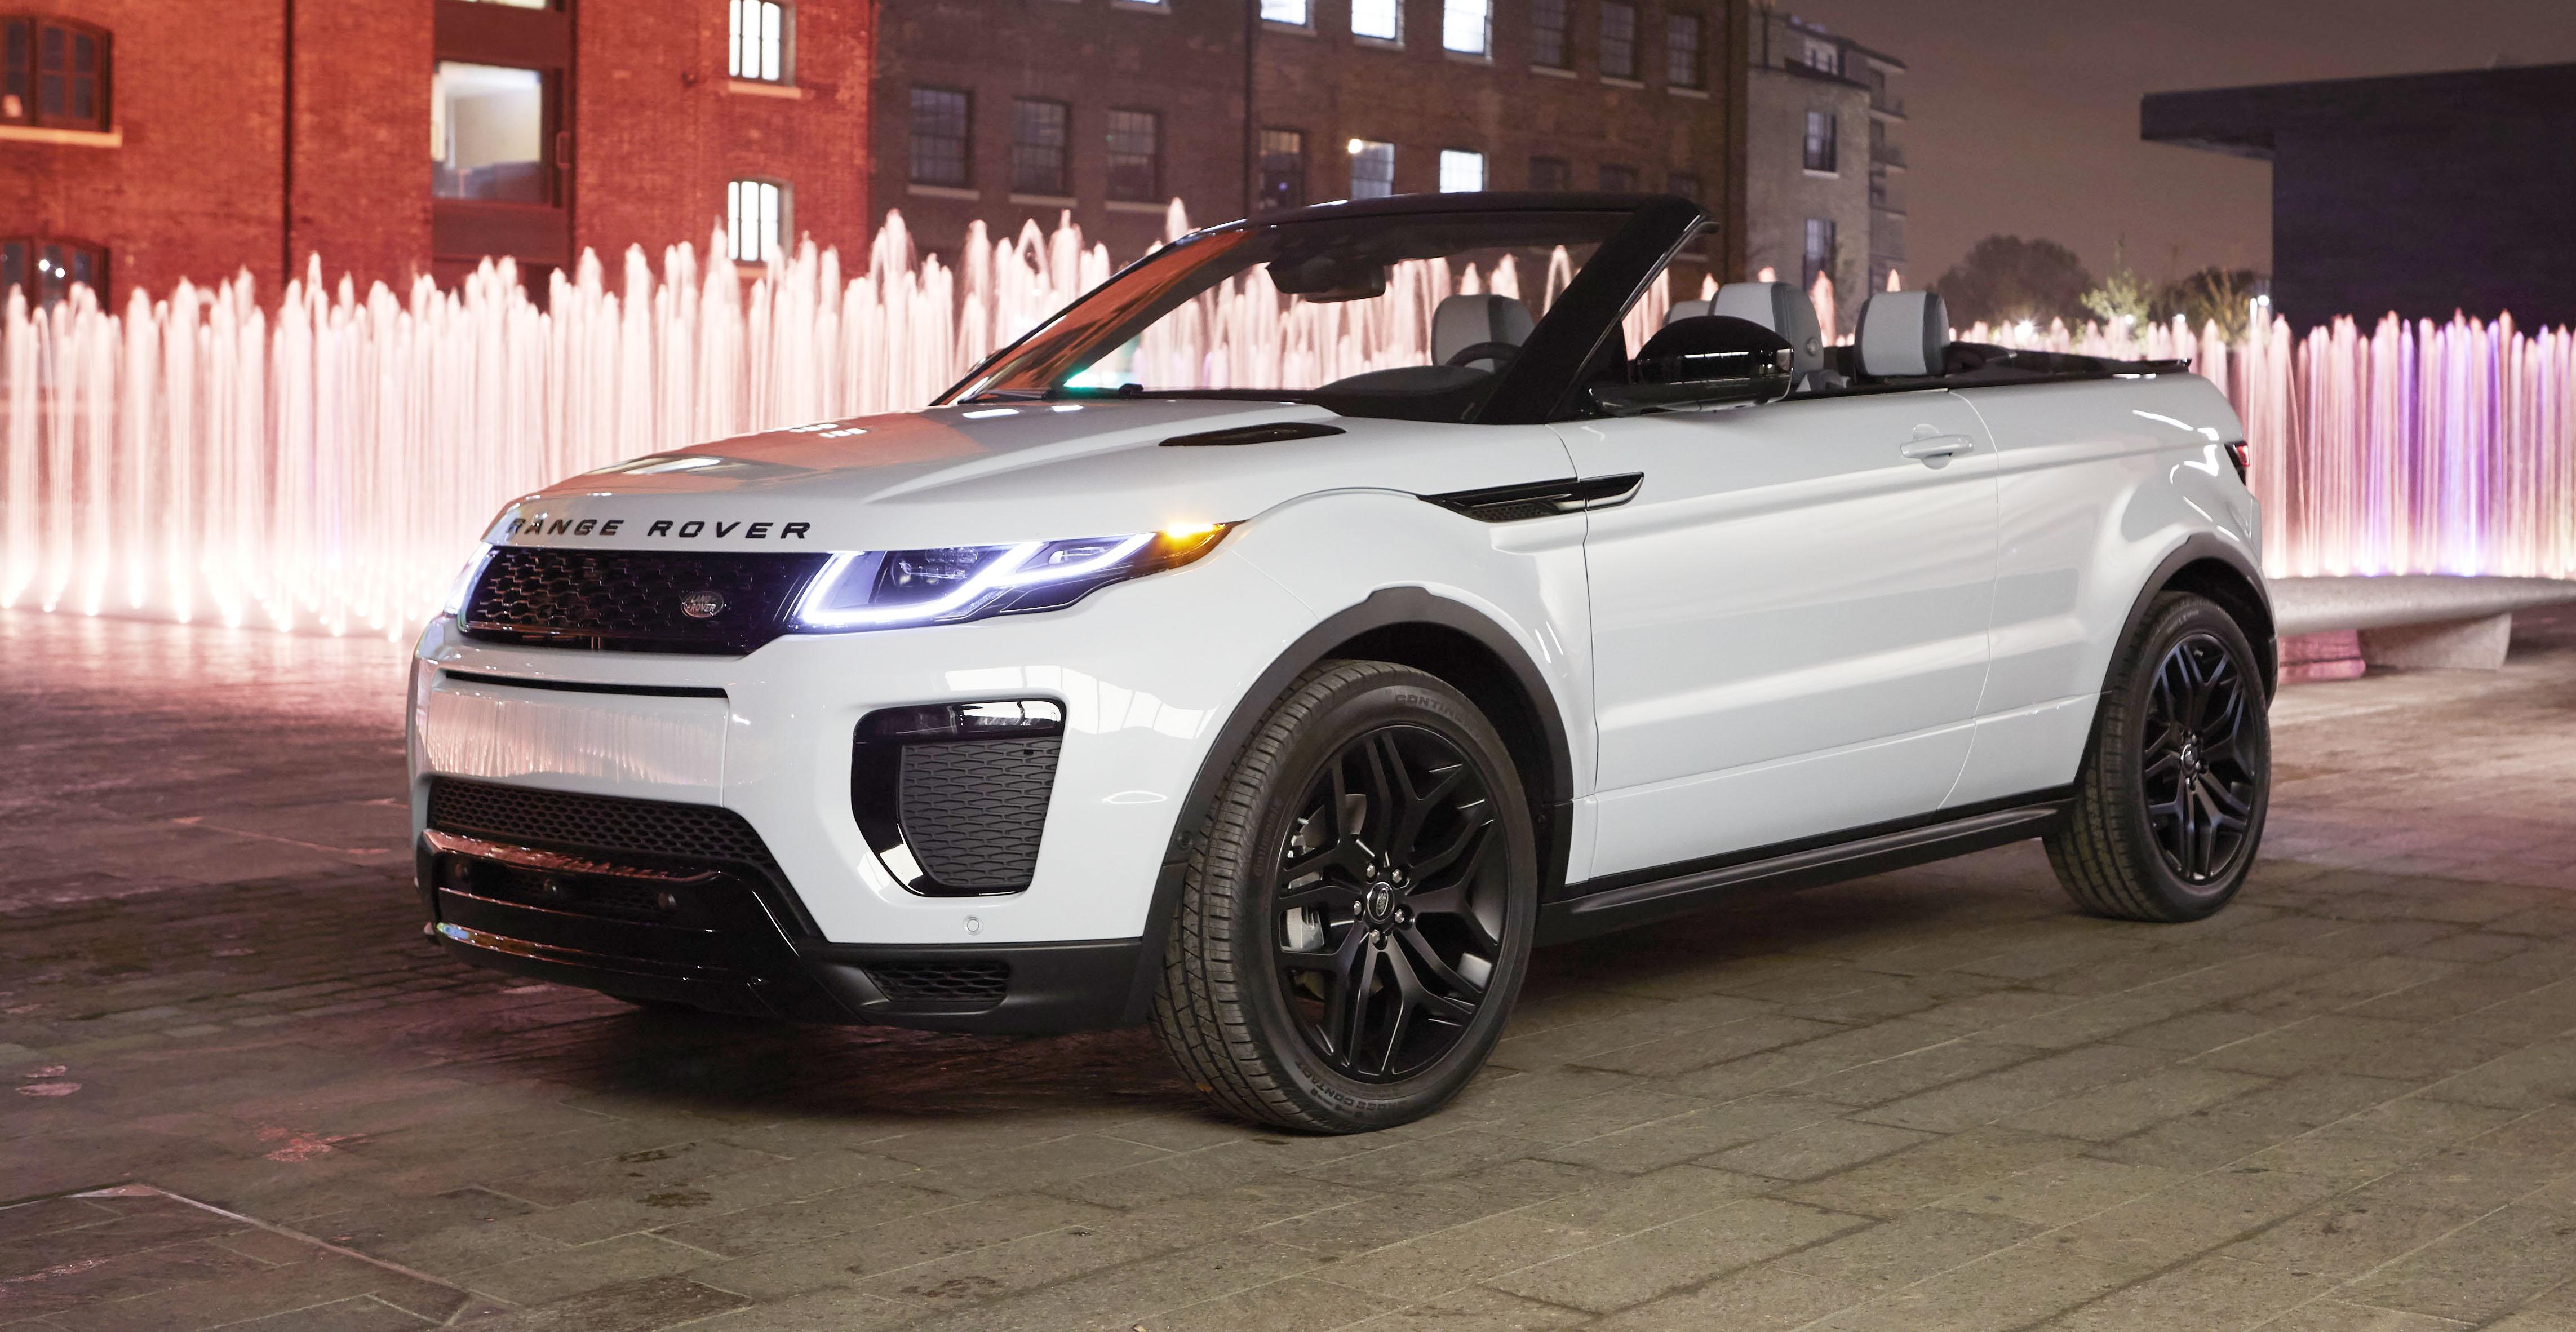 Range Rover Convertible >> Range Rover Evoque Convertible Revealed 84 440 Ragtop In